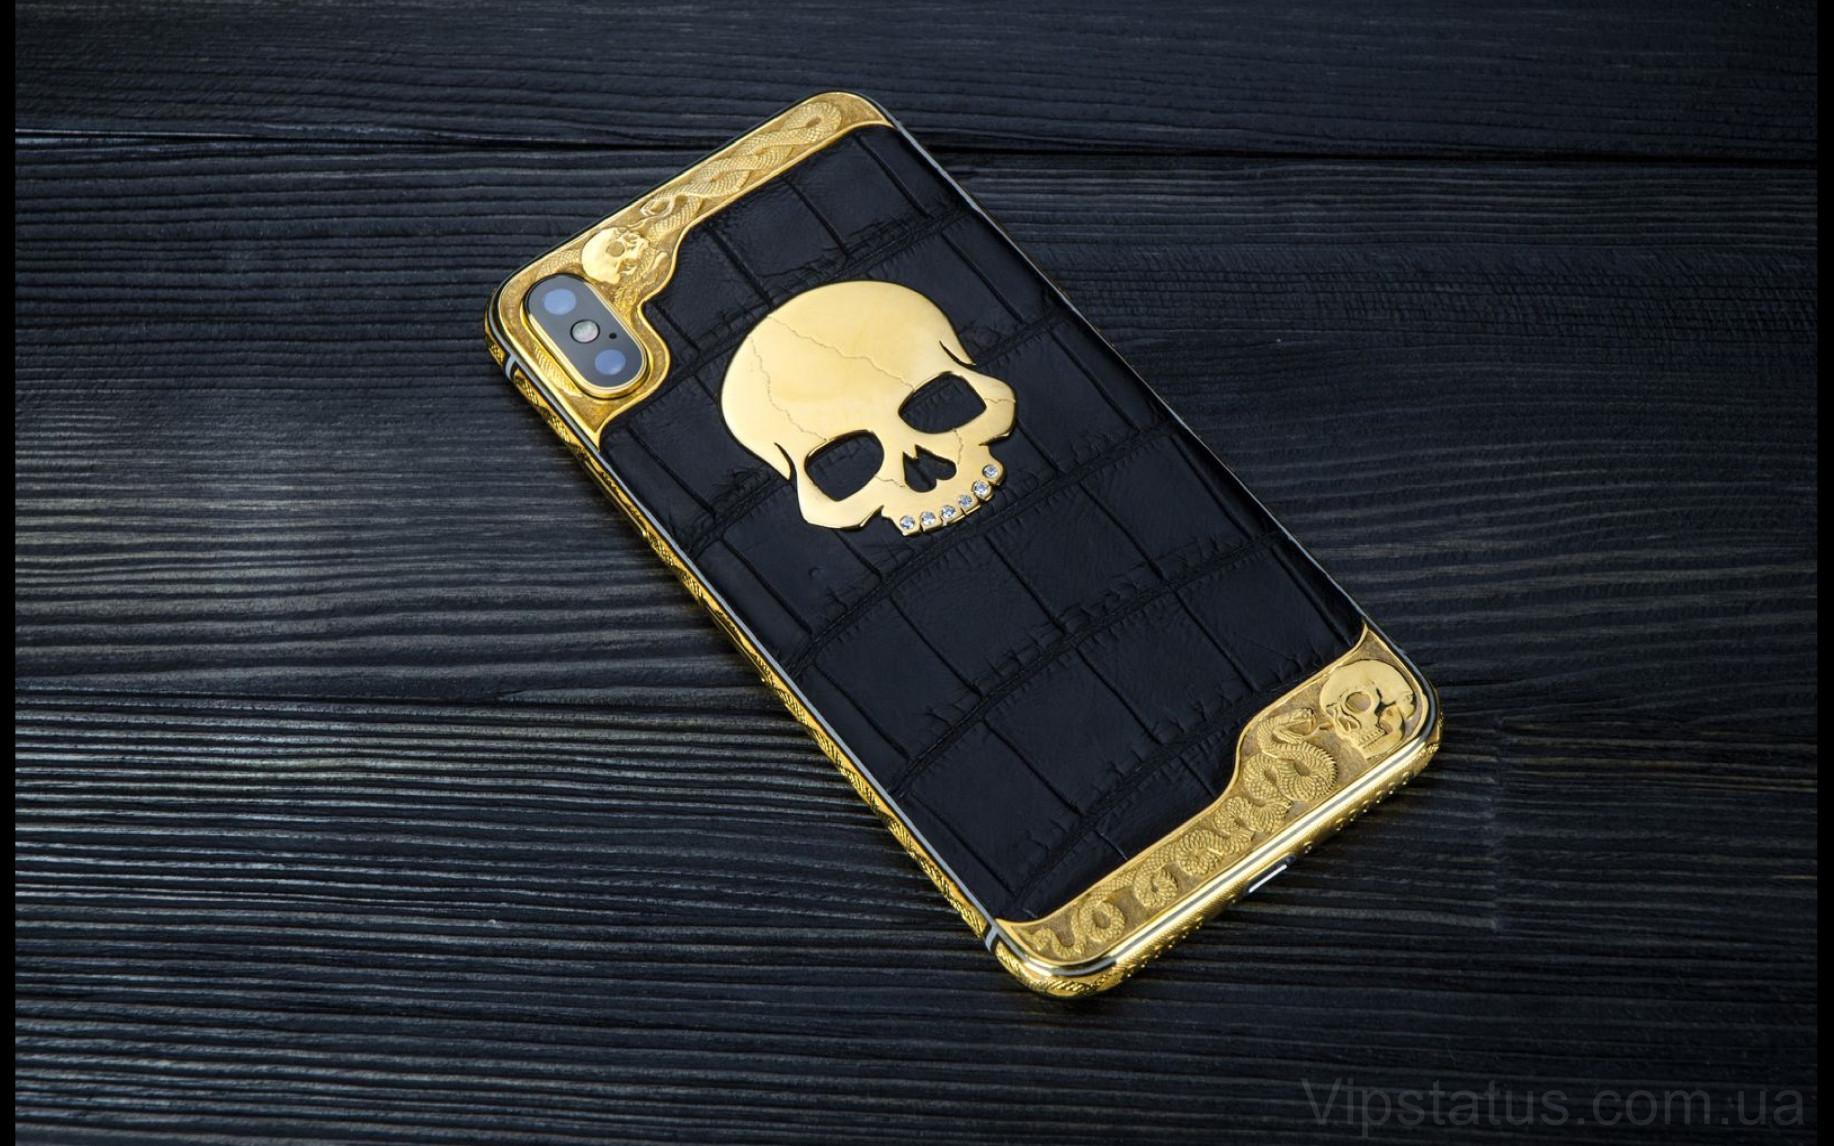 Elite Night Horror IPHONE XS 512 GB Night Horror IPHONE XS 512 GB image 10